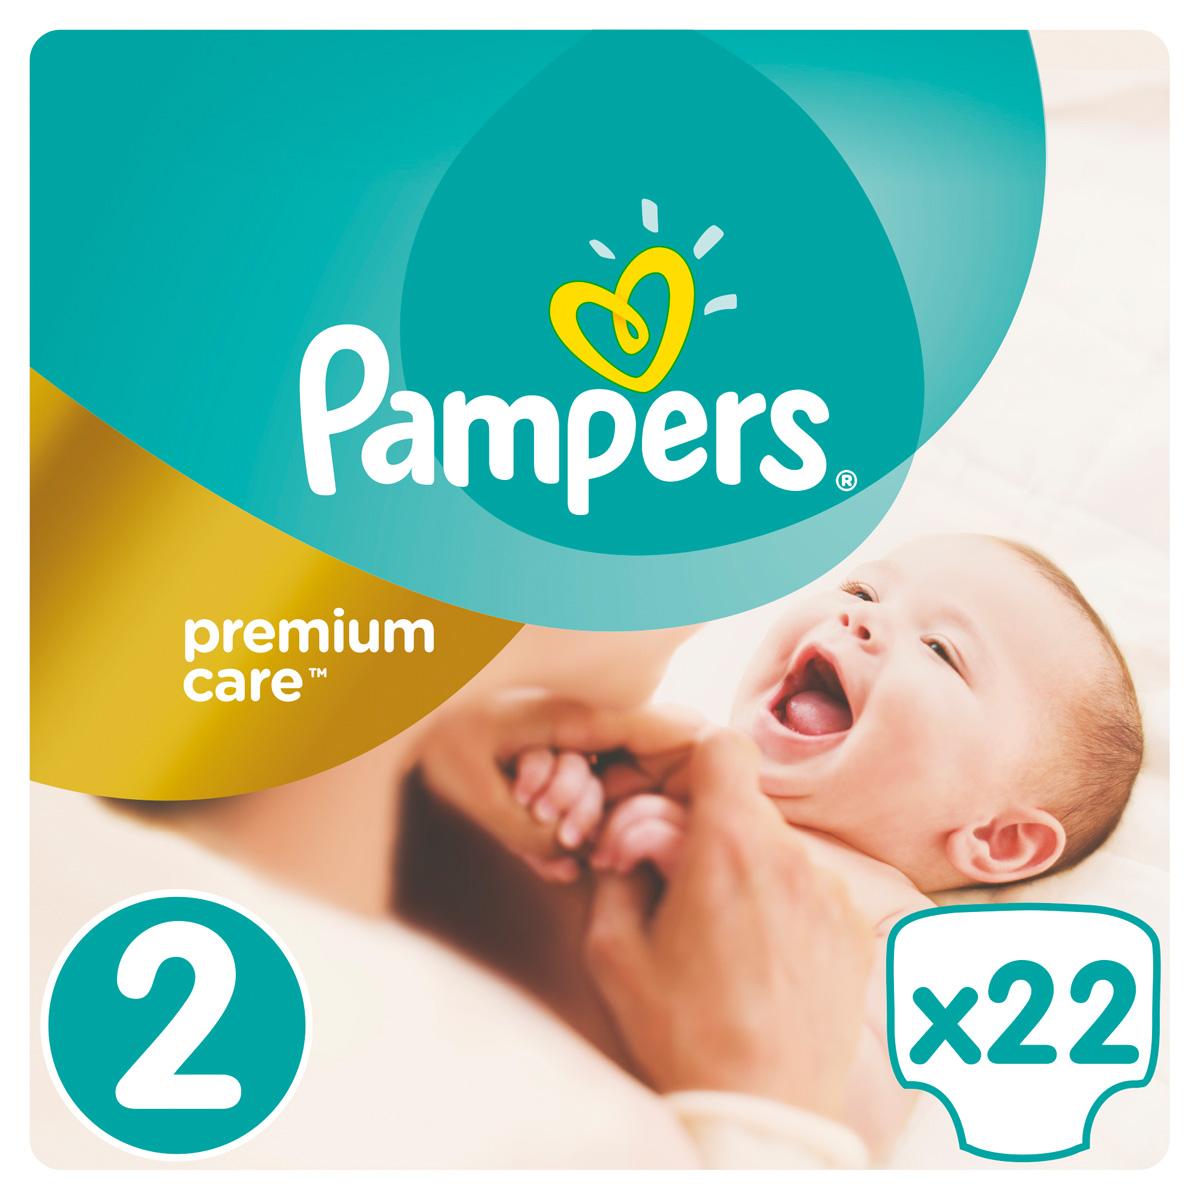 Pampers Подгузники Premium Care 3-6 кг (размер 2) 22 шт подгузники детские pampers подгузники pampers premium care 3 6 кг 96 шт